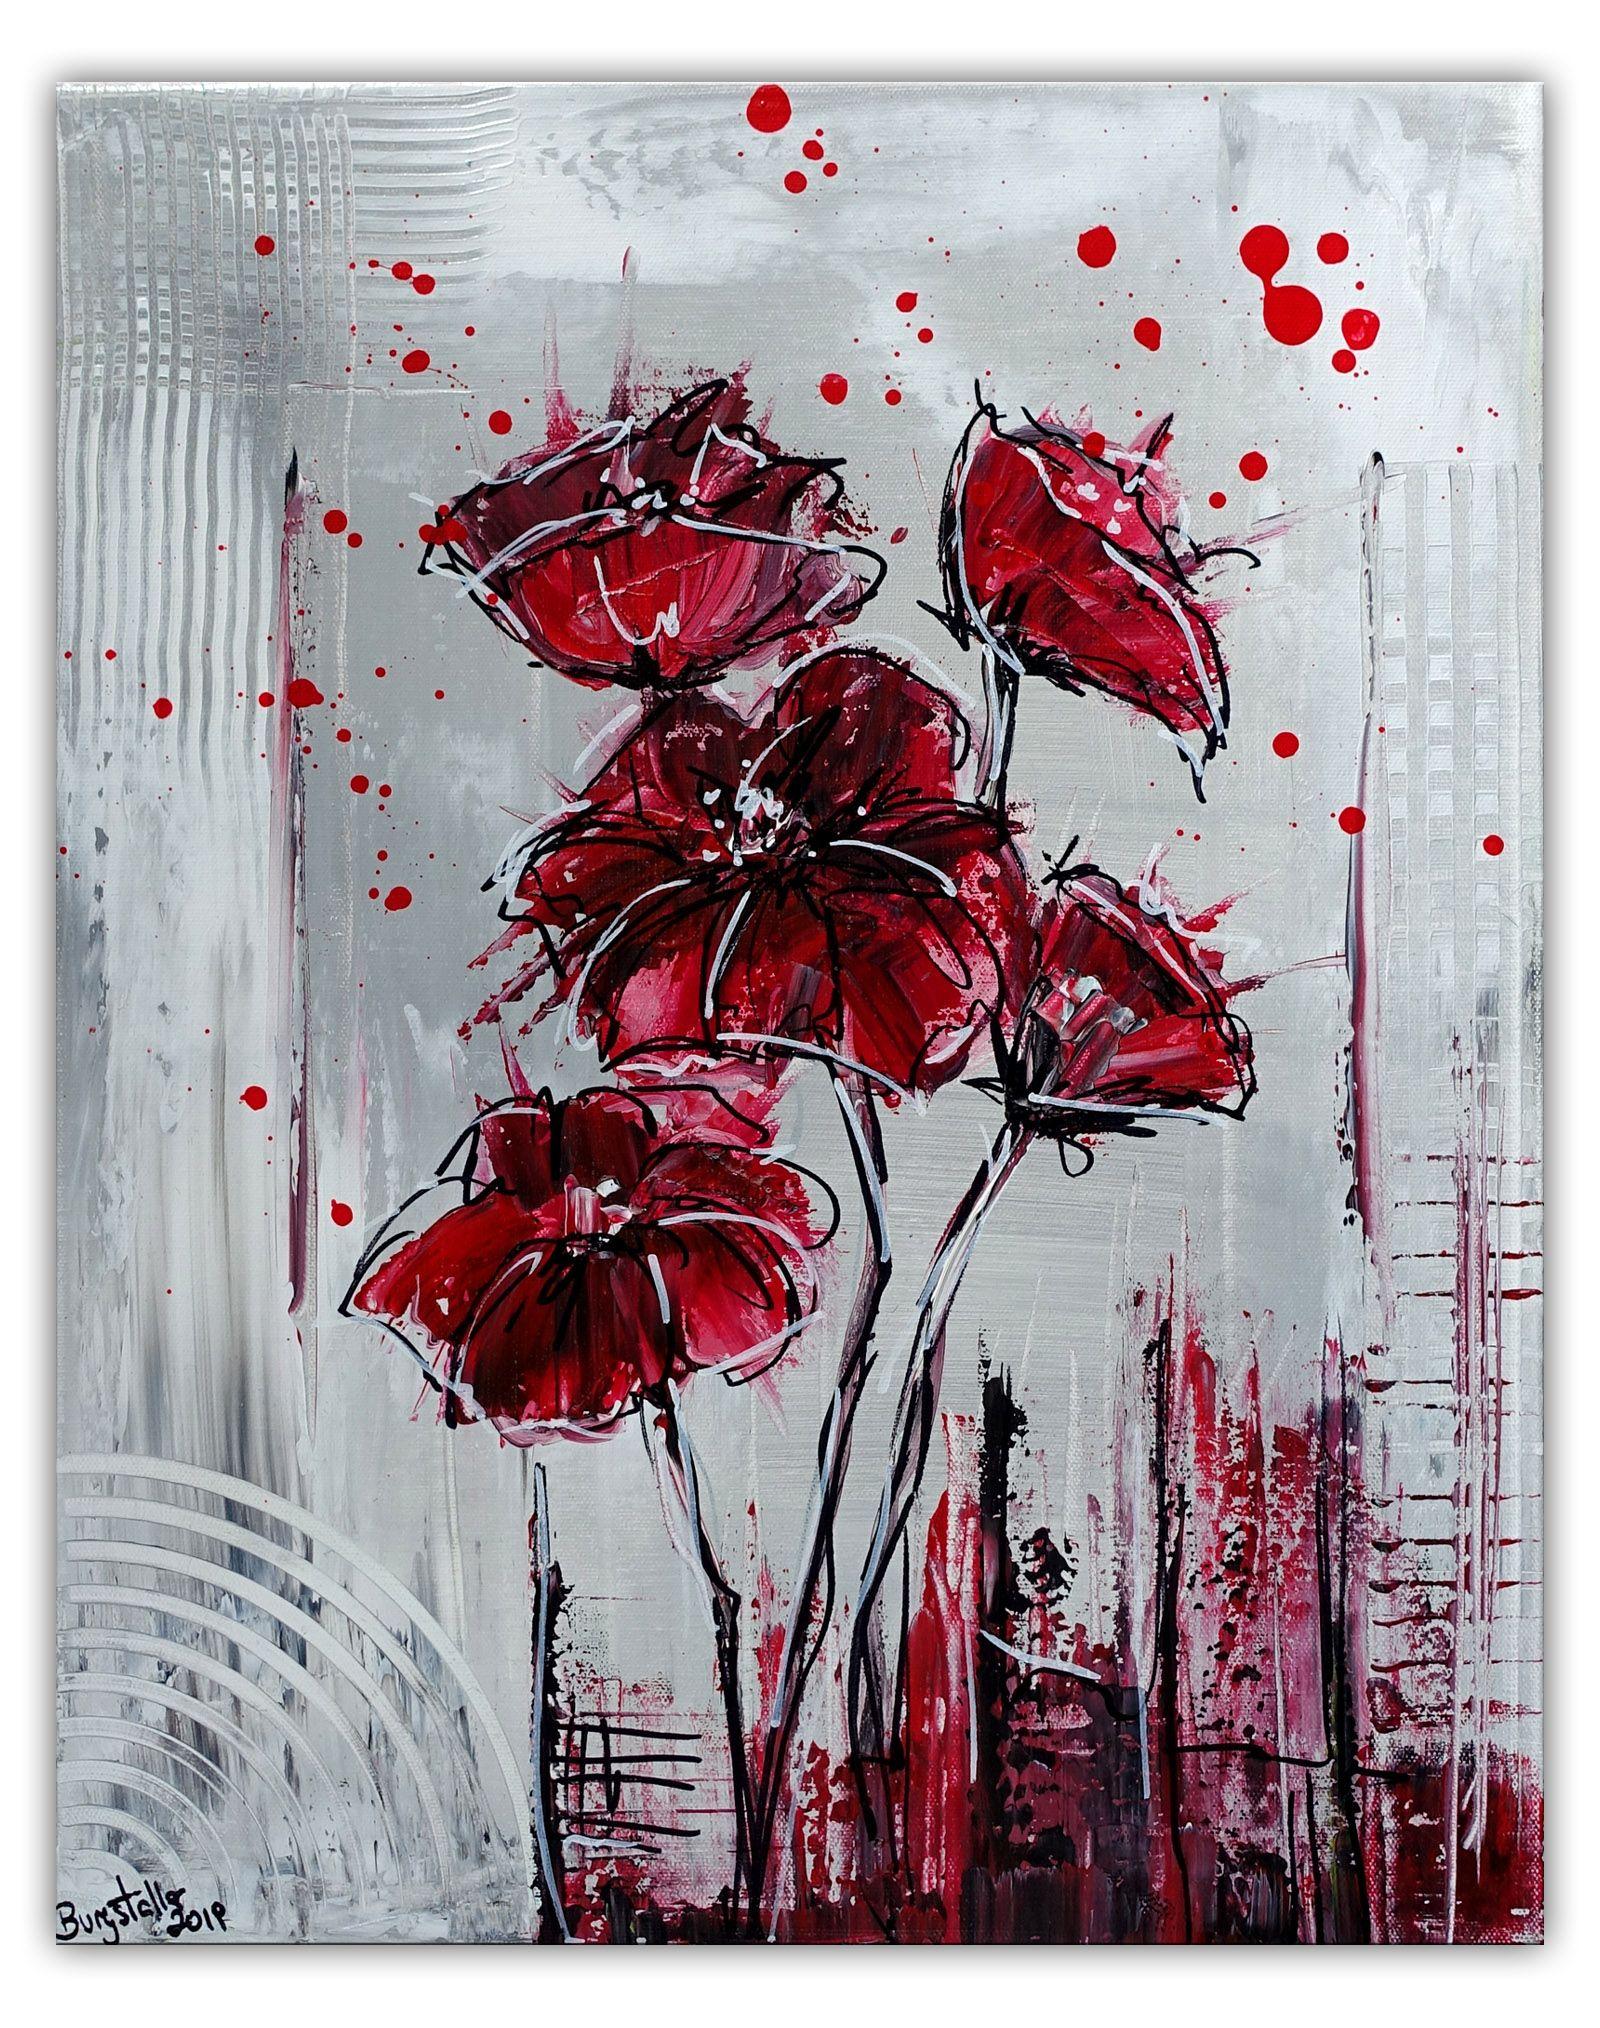 wandbild mohn handgemaltes blumenbild acrylbild acrylbilder malerei blumenbilder abstrakte kunst spachteltechnik maler